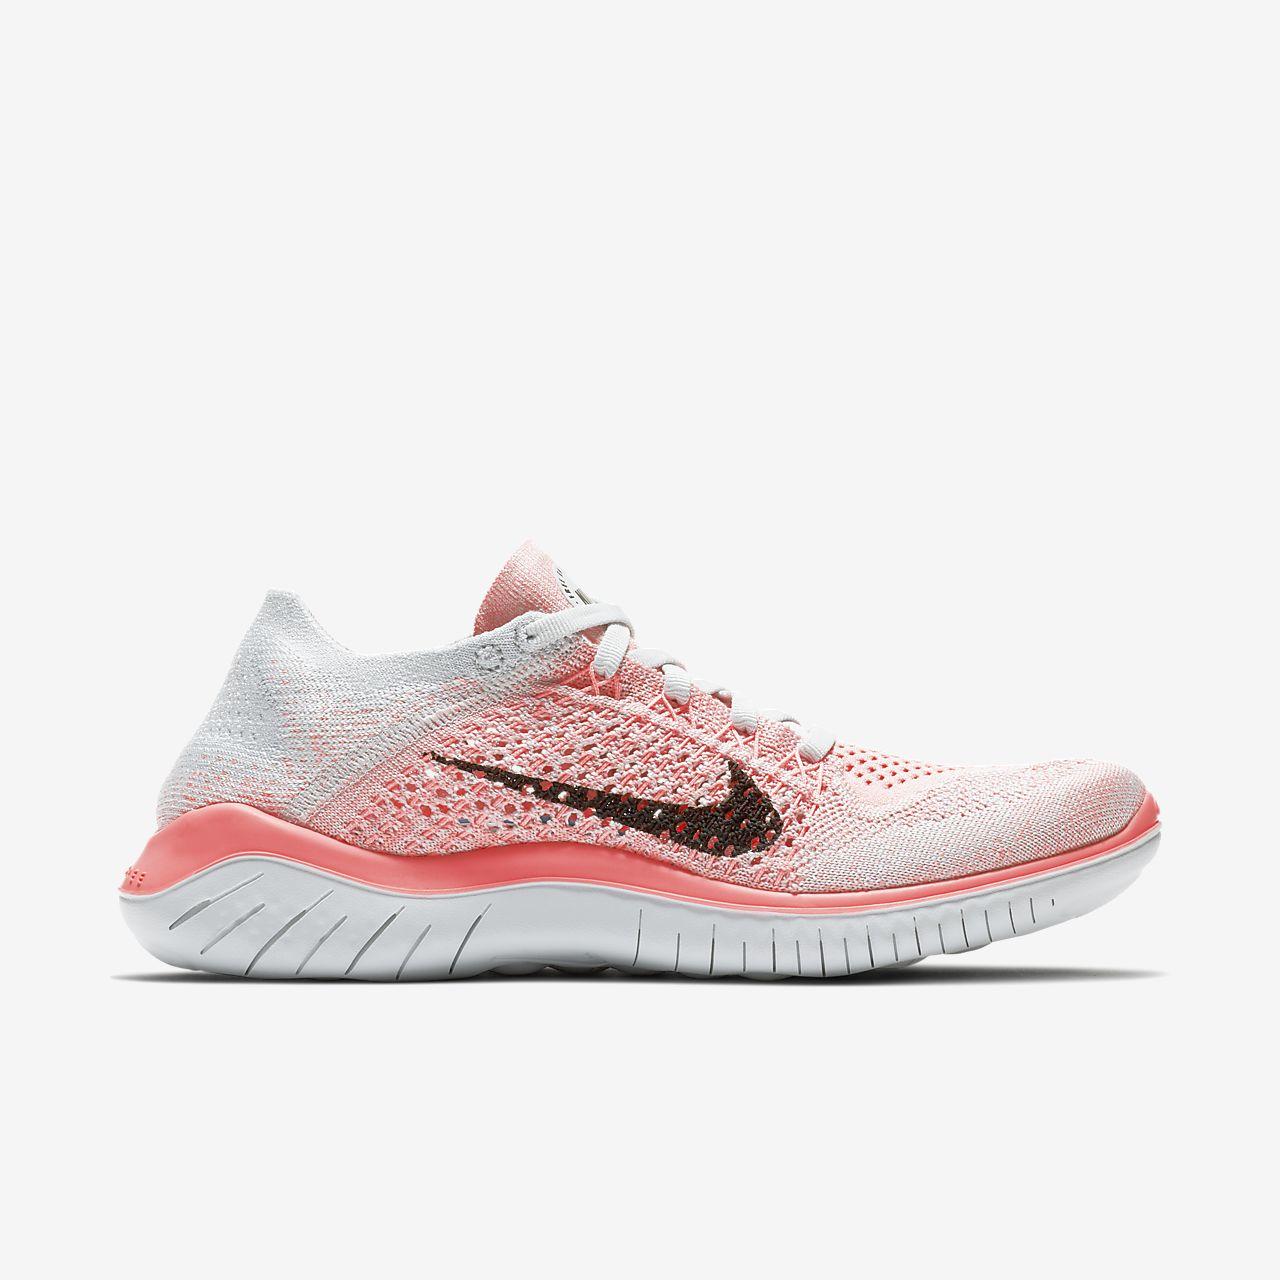 Nike Free RN Flyknit 2018 Damen-Laufschuh - Pink 6Q44O